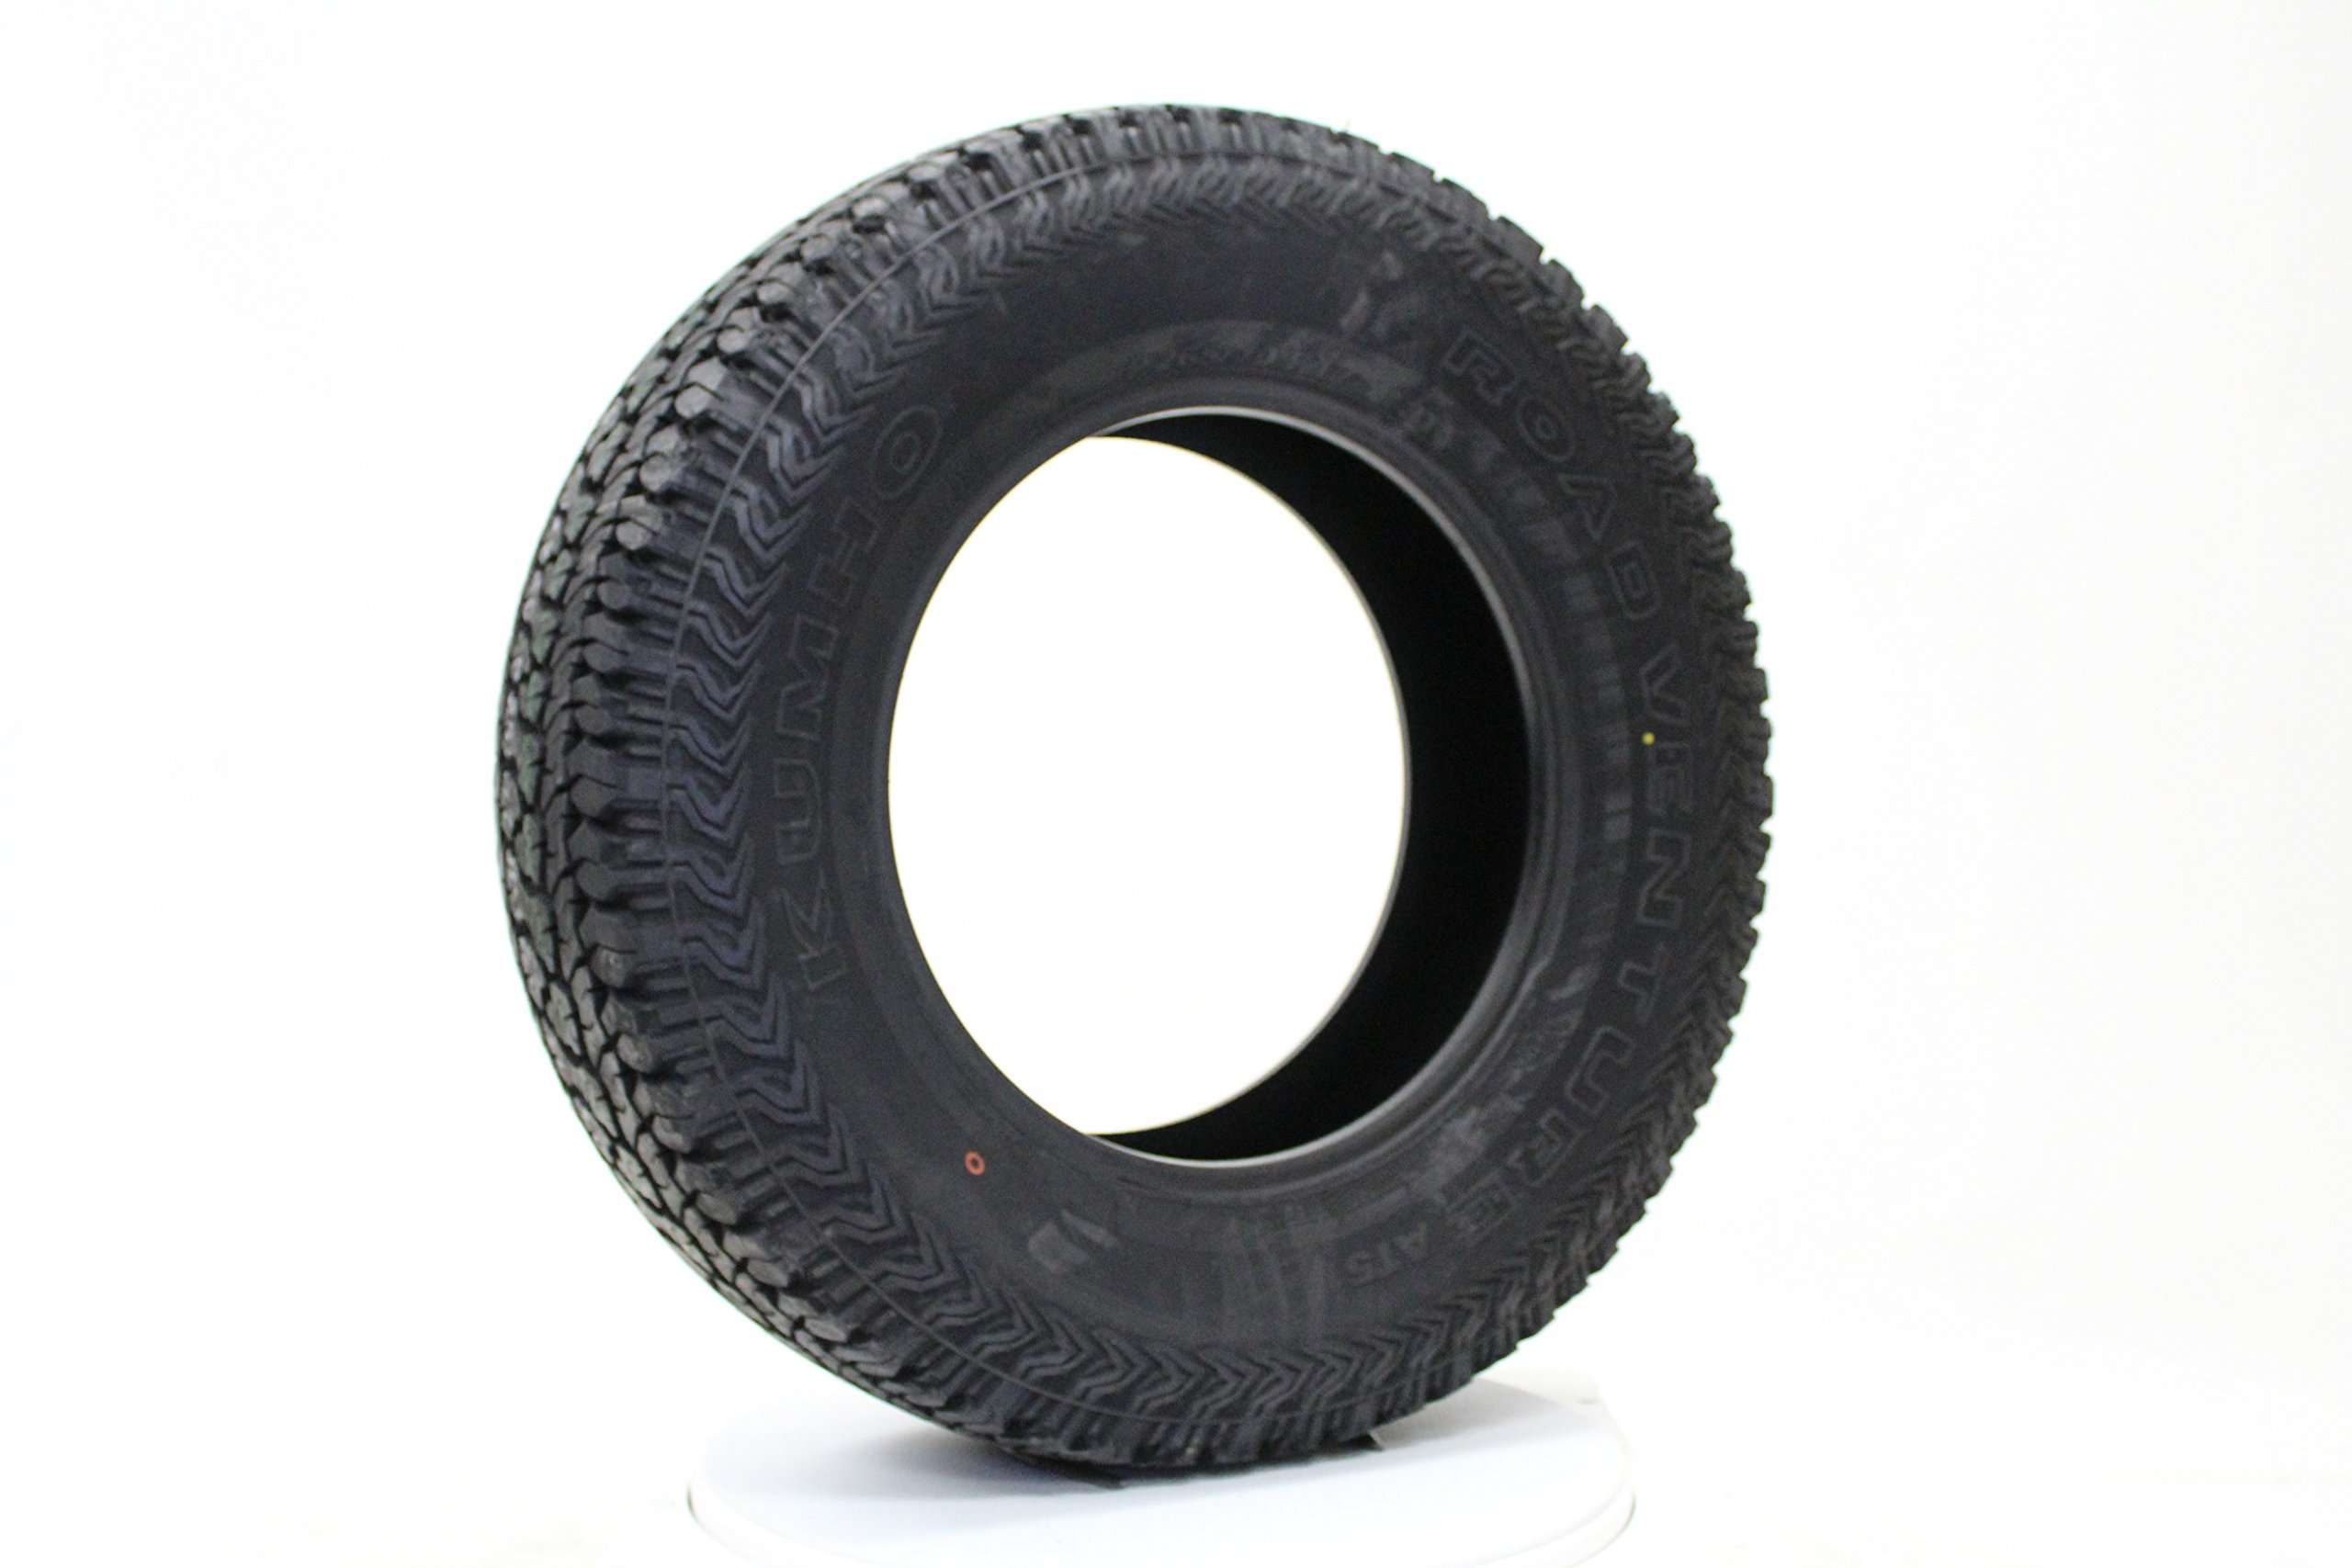 Kumho Road Venture AT51 All-Terrain Tire – P245/65R17 105T